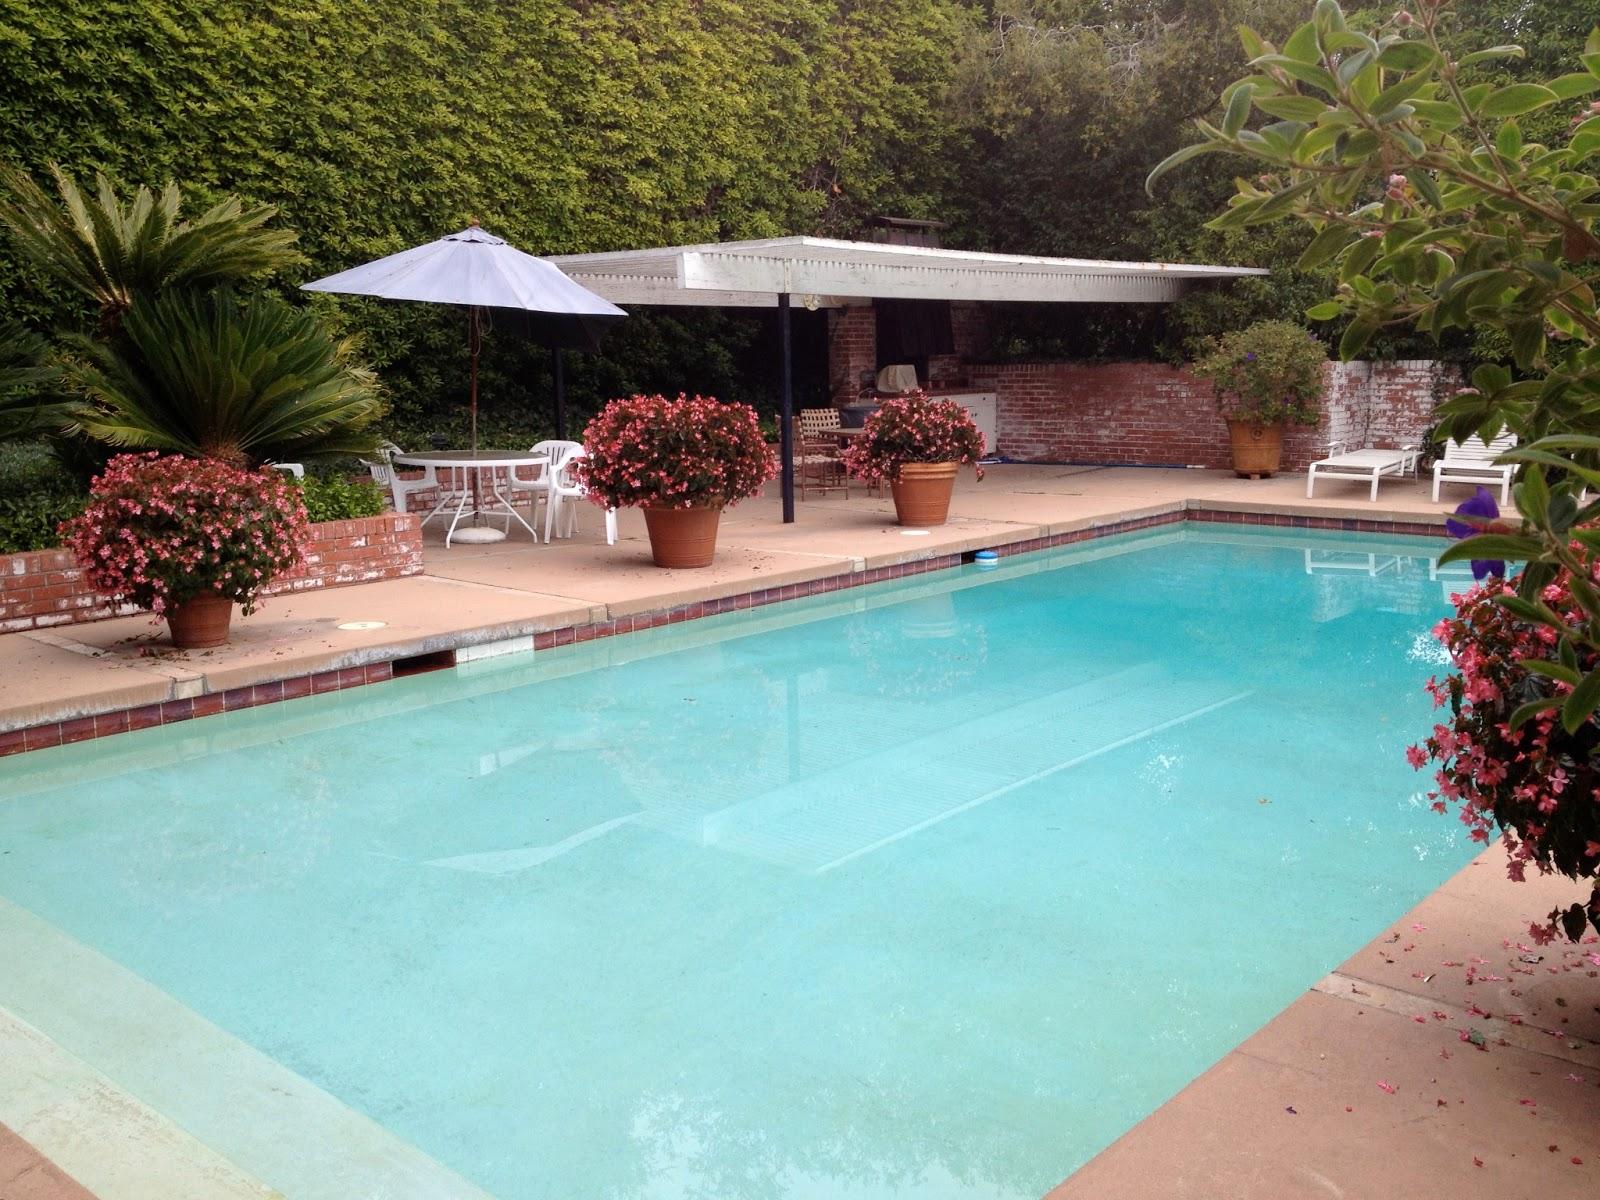 Backyard Splash